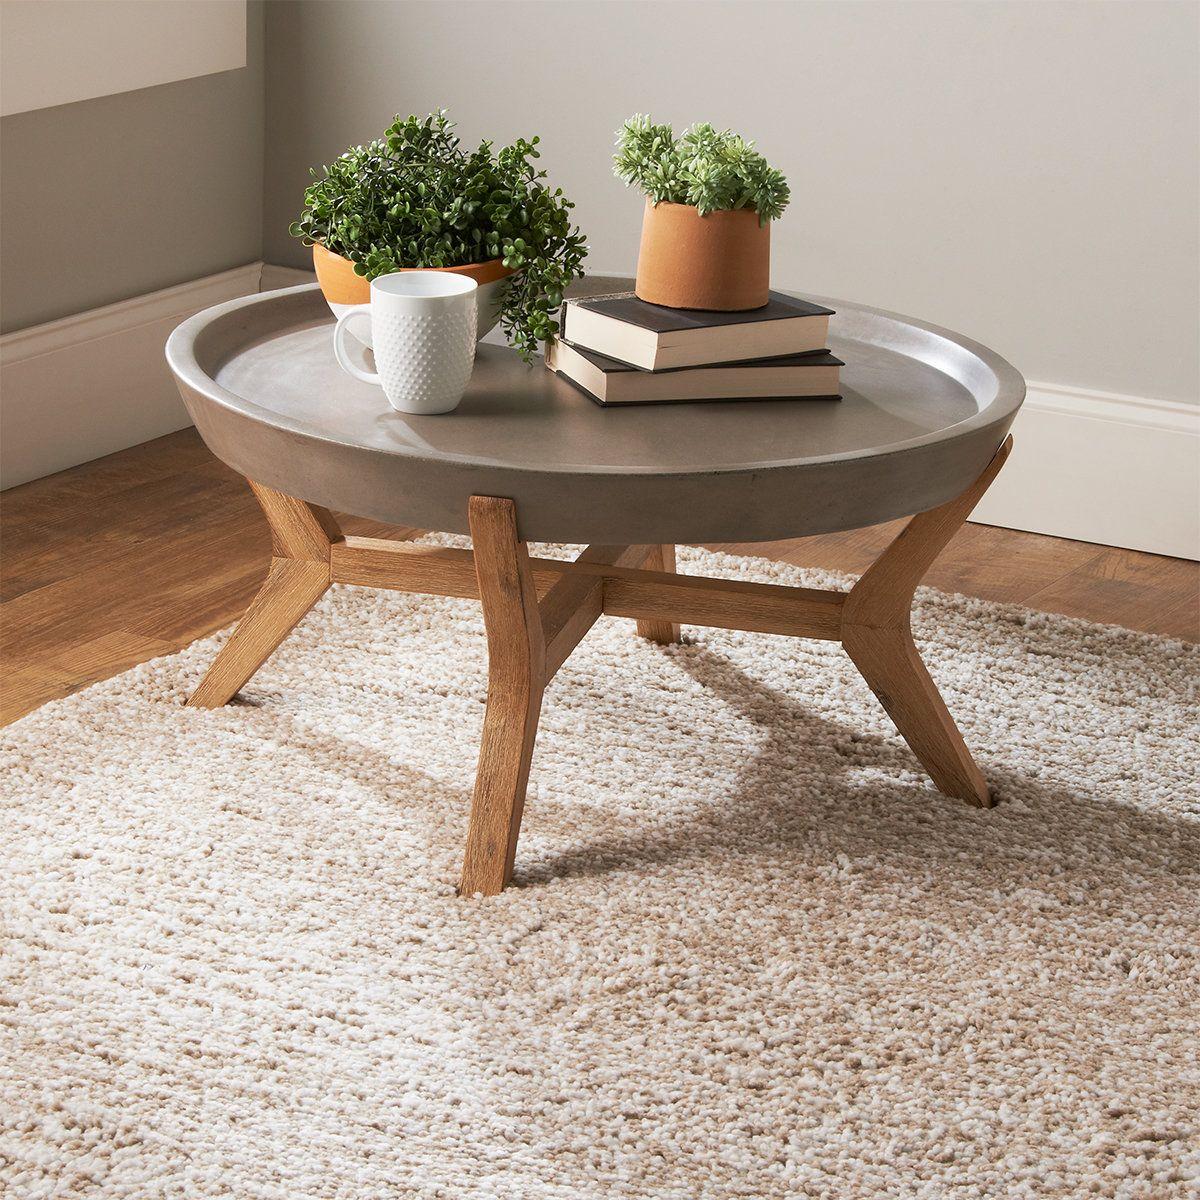 Round Concrete Tray Coffee Table Concrete Coffee Table Round Wood Coffee Table Coffee Table Inspiration [ 1200 x 1200 Pixel ]